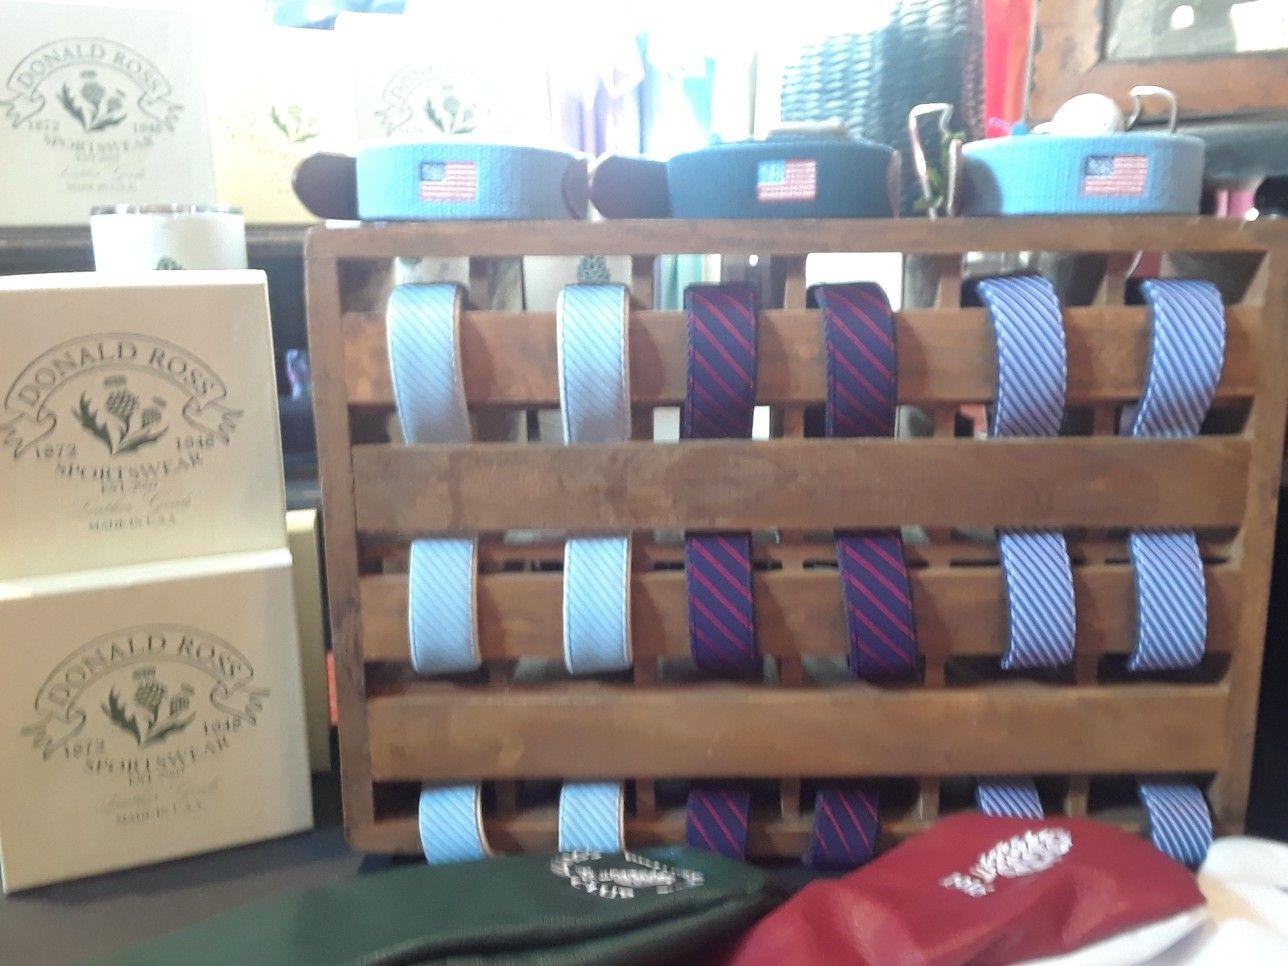 Retail belt display   Belt display, Merchandise, Display